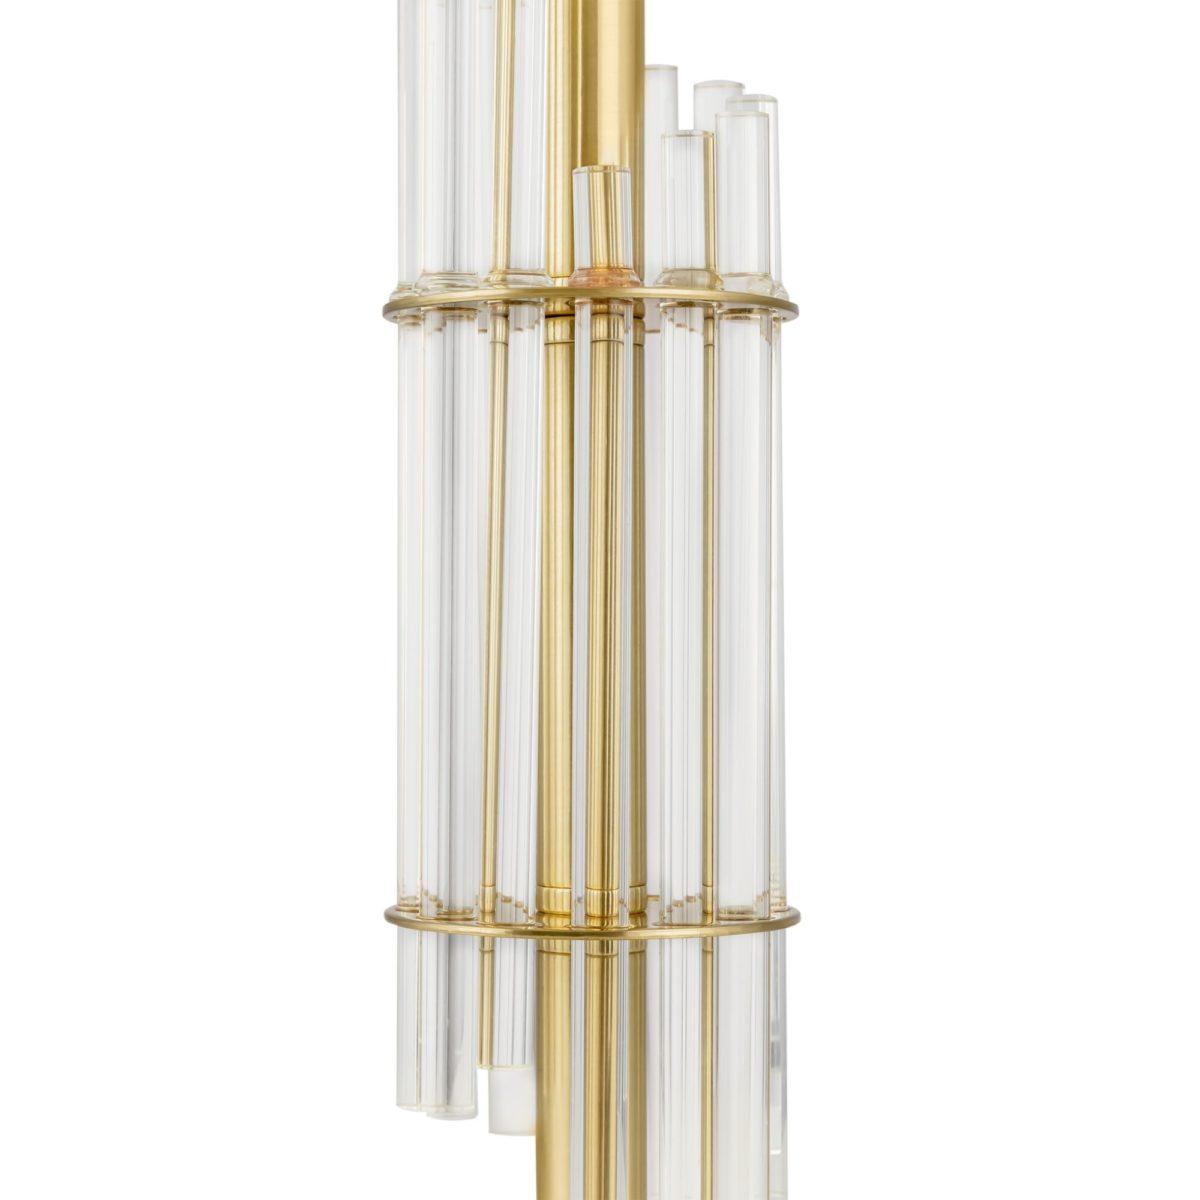 Настольная лампа Alloro MOD088TL-01BS maytoni